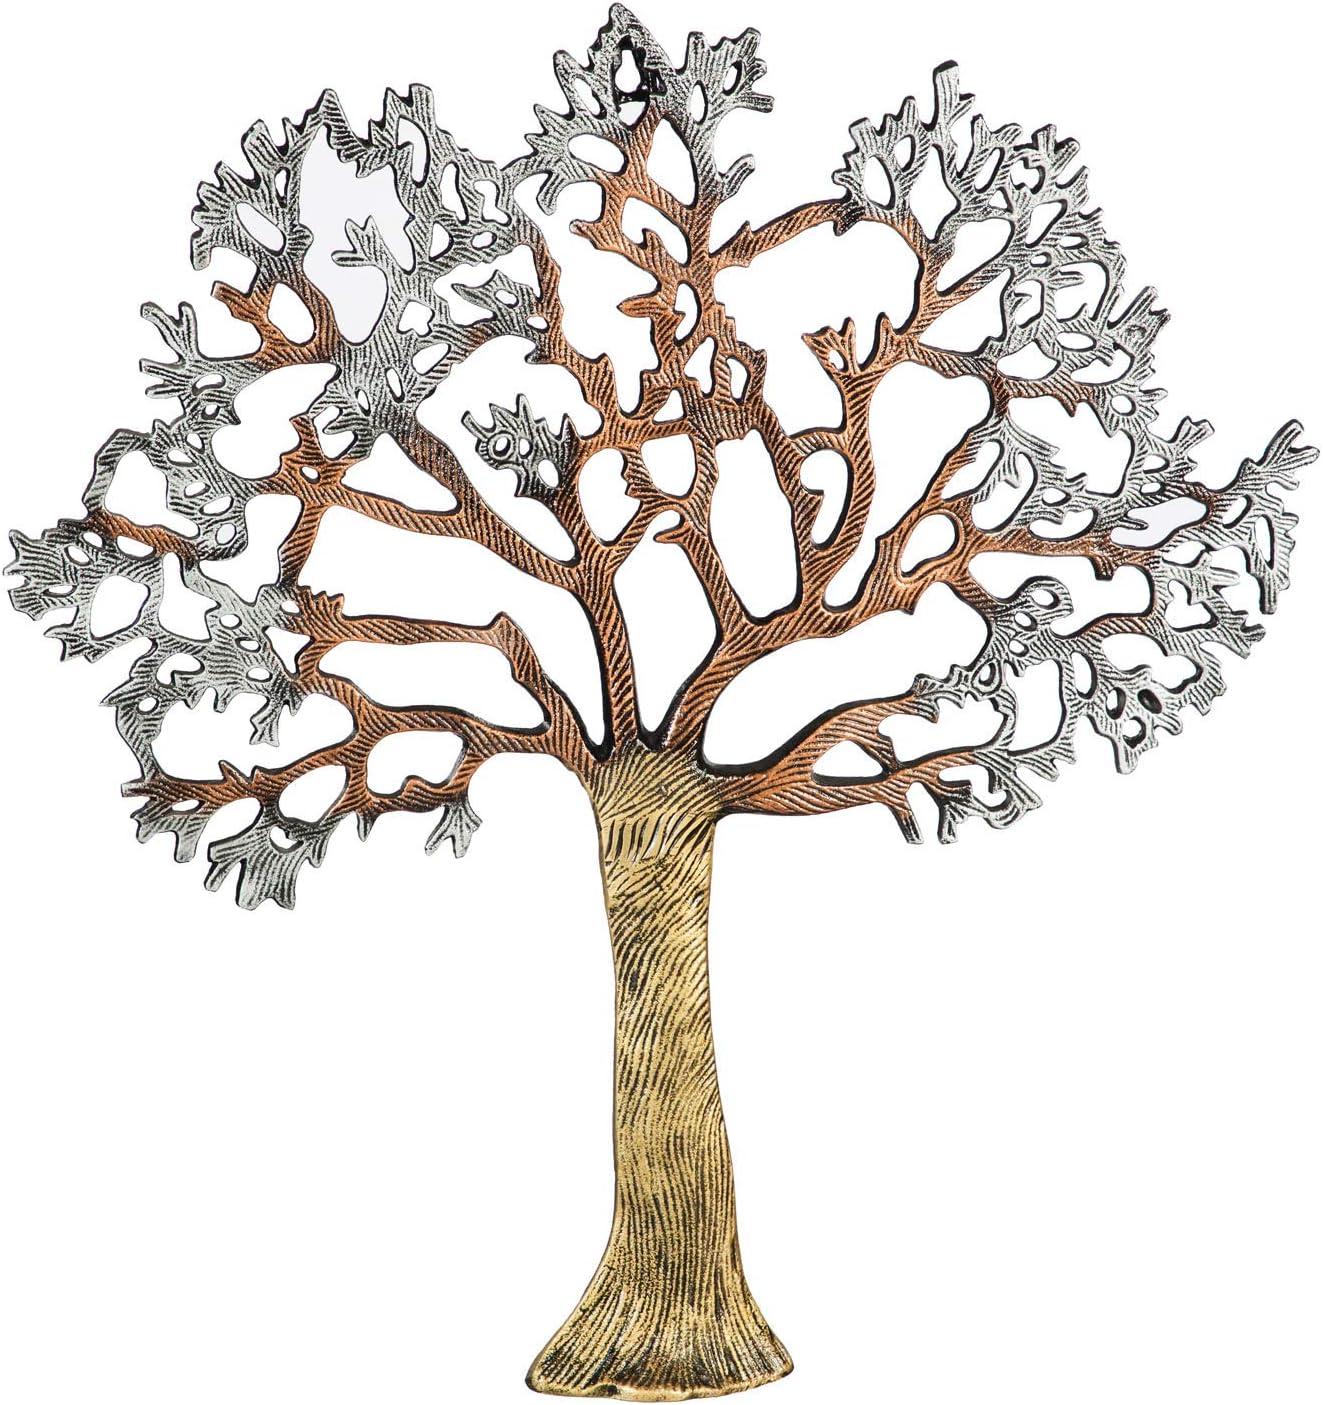 Cape Craftsmen Metallic Tree Outdoor Metal Wall Art Indoor Outdoor Décor and Home Accents for Garden and Yard